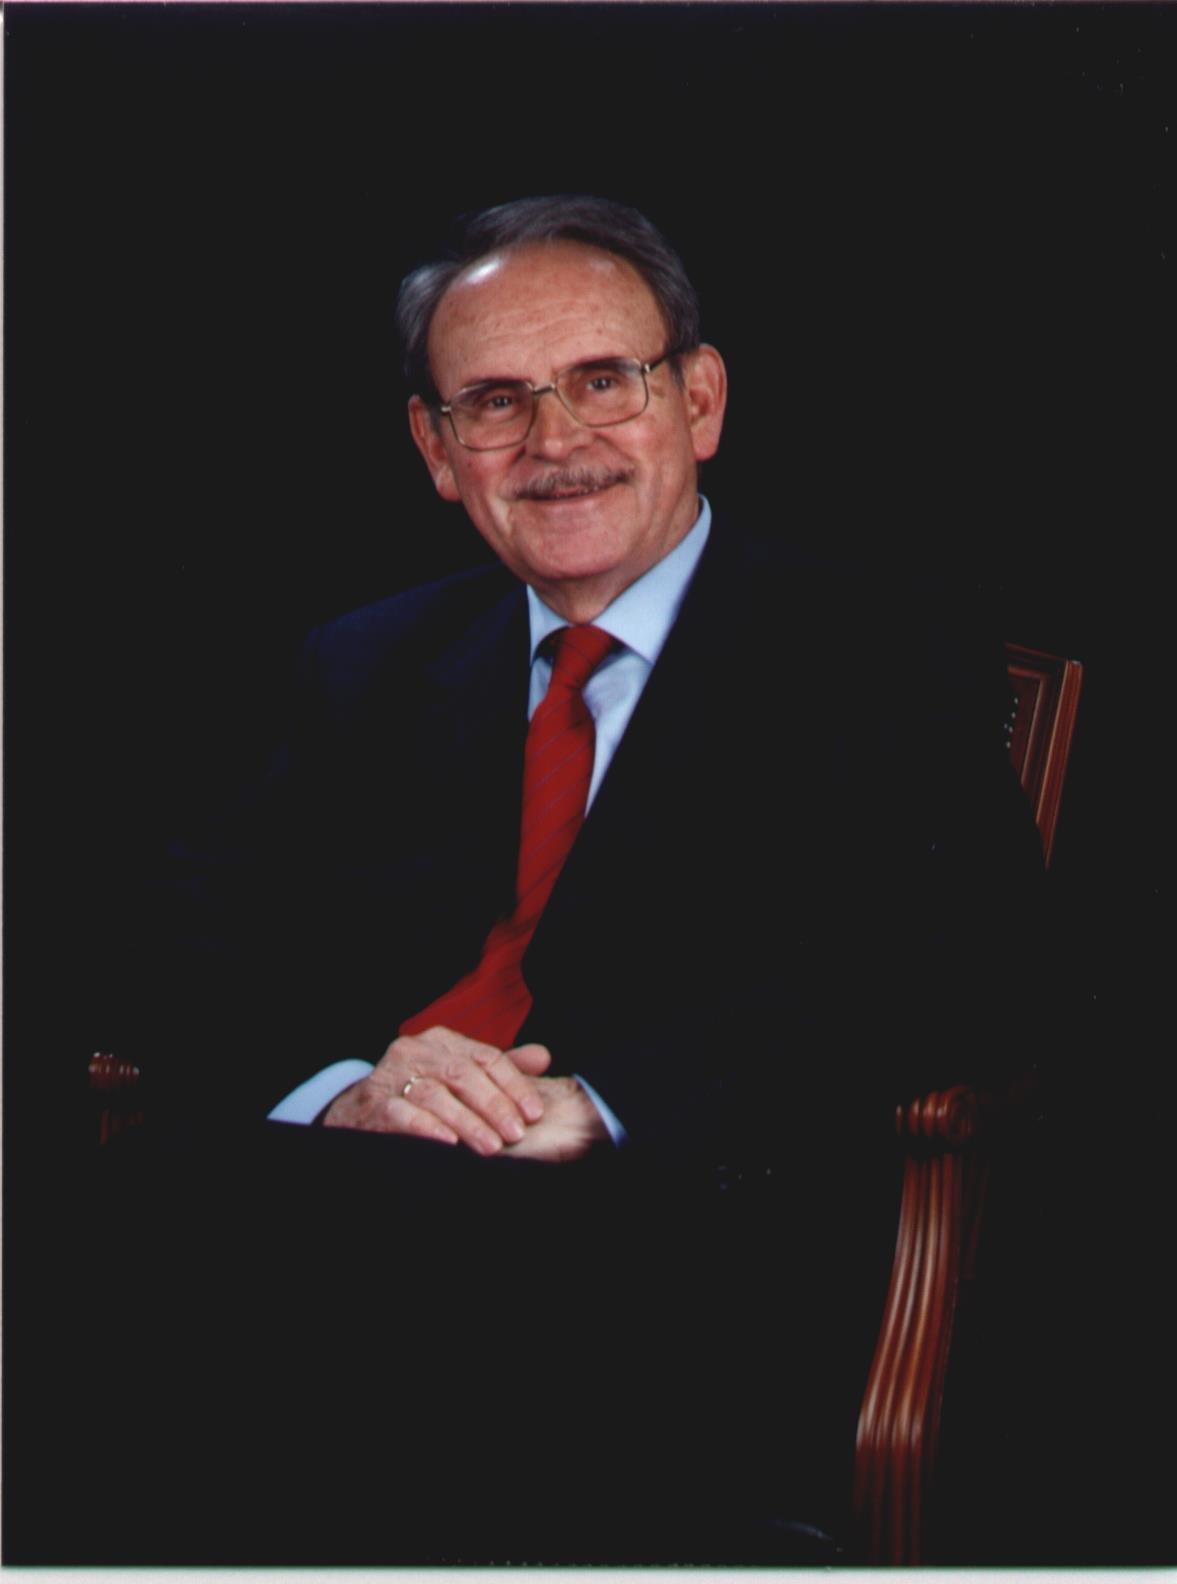 Sr. Joan Jordi Bergós Tejero